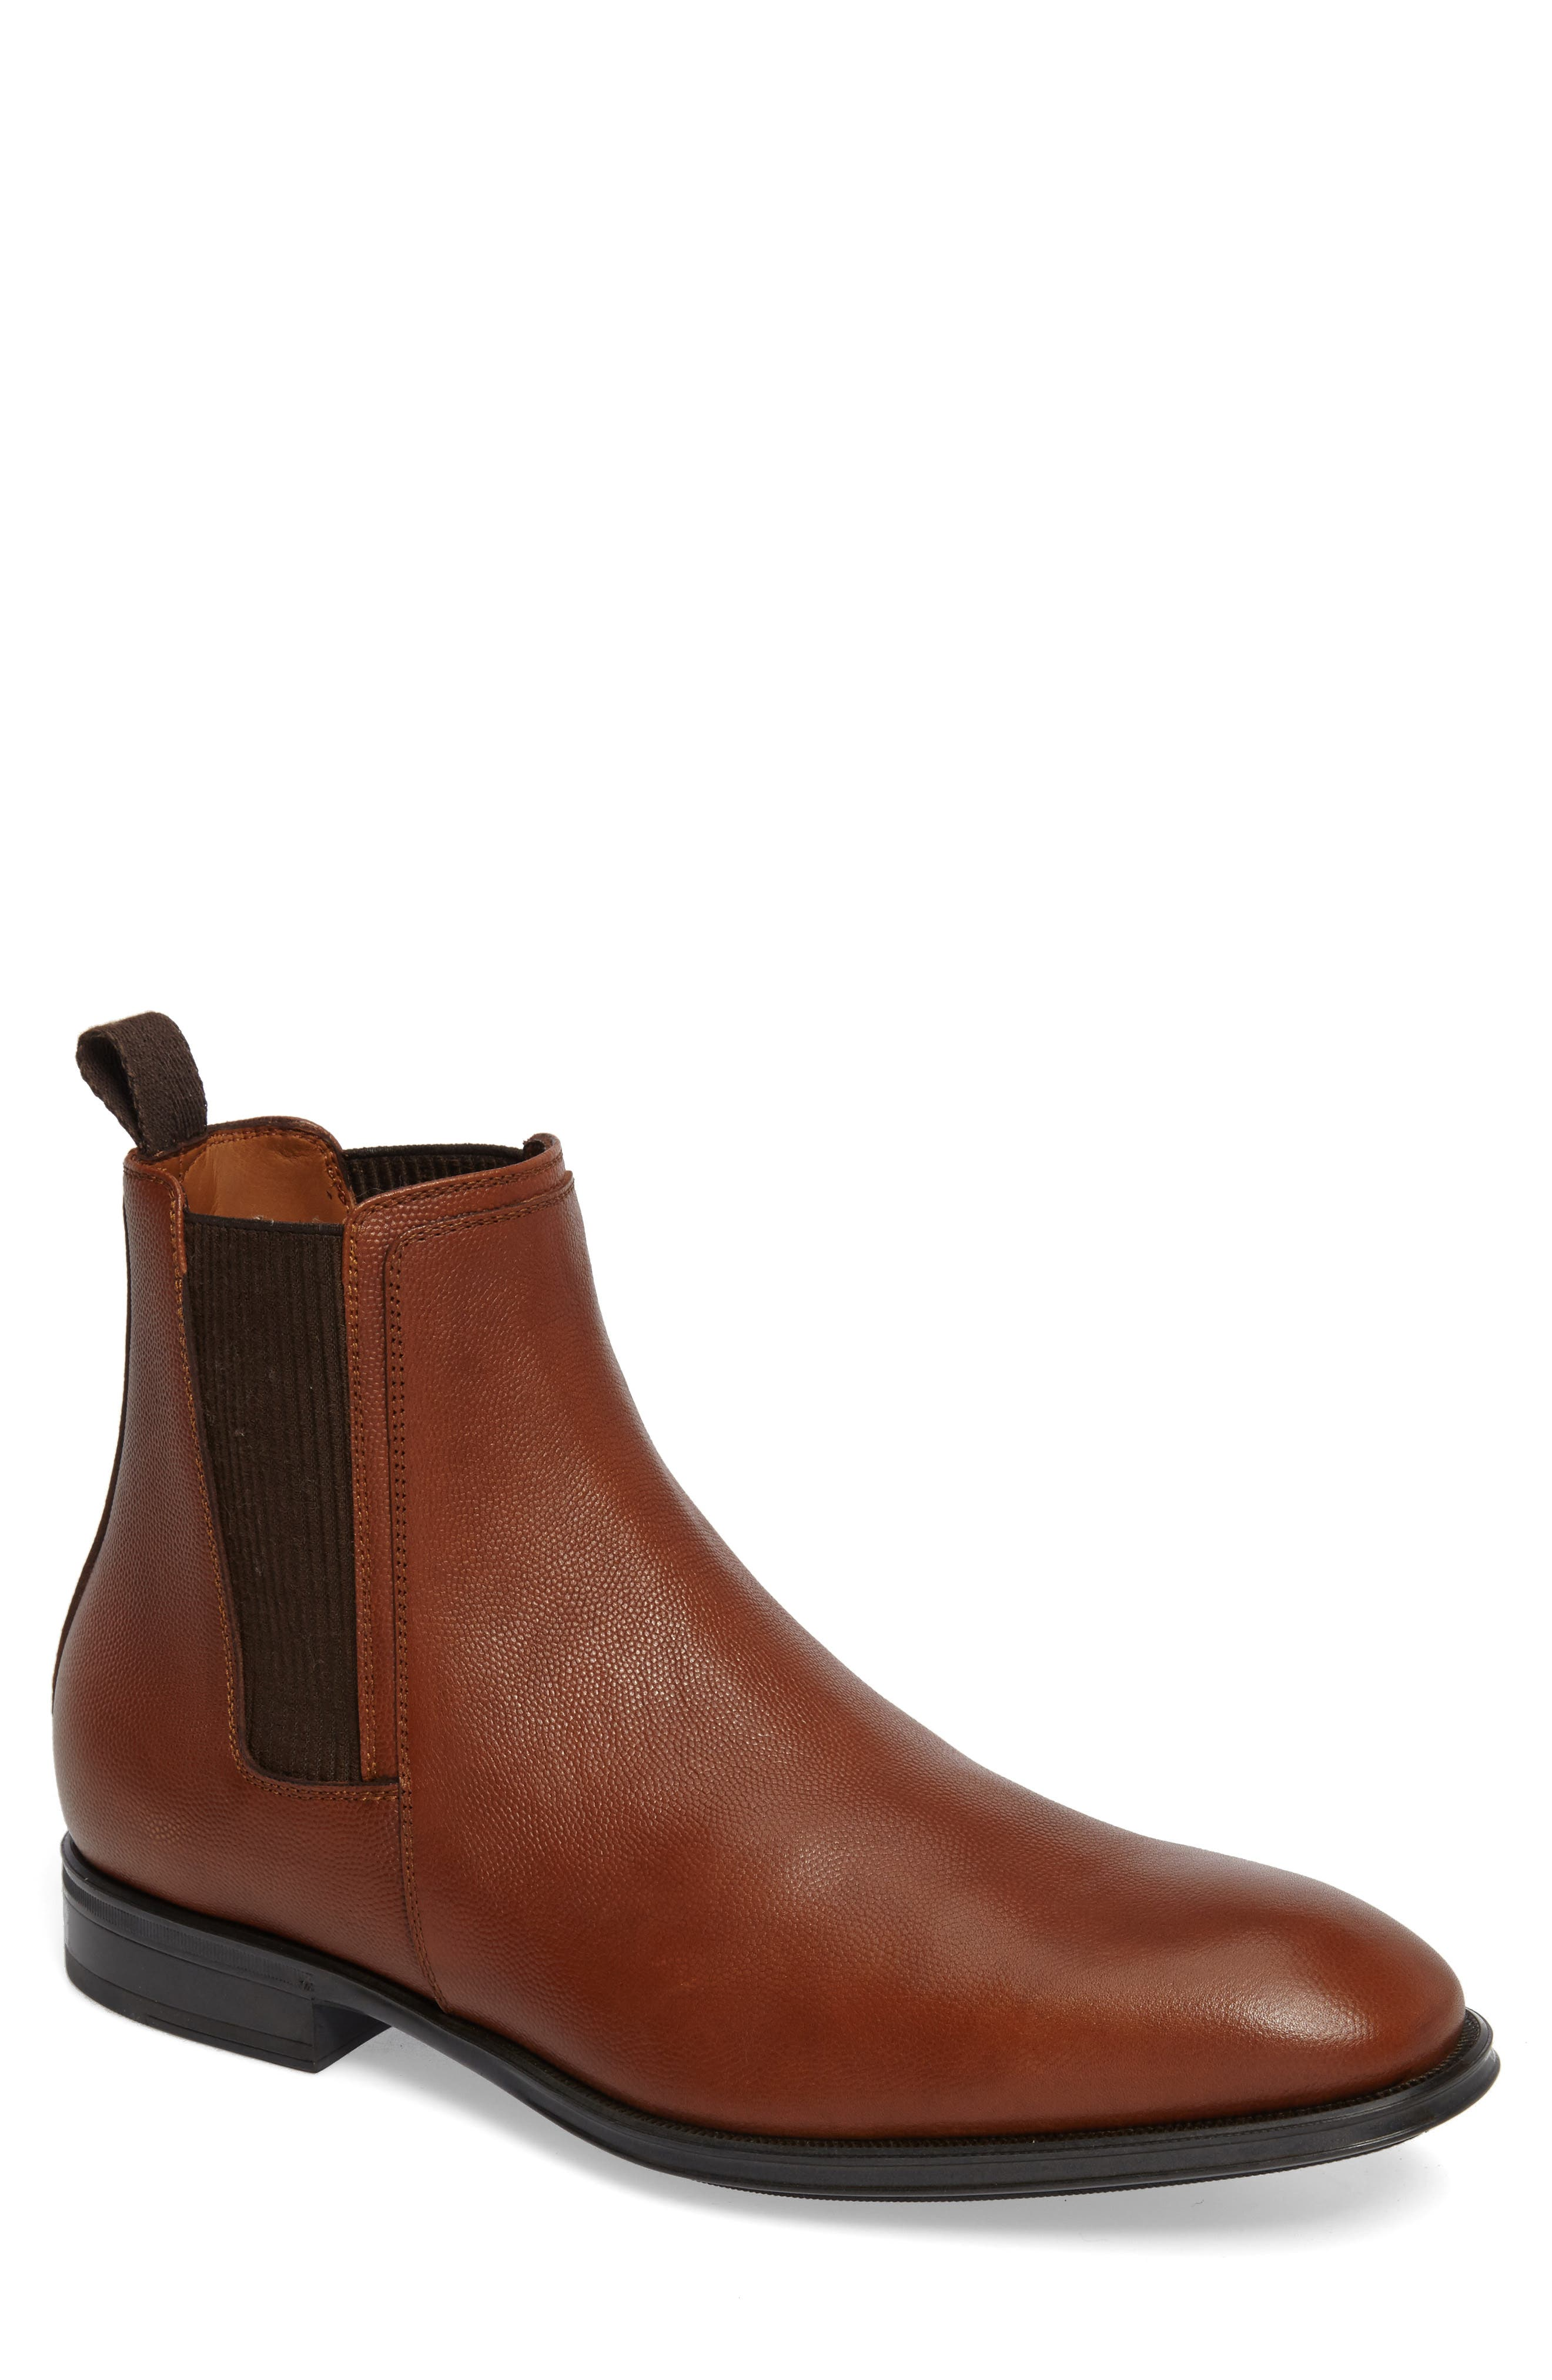 Damon Chelsea Boot,                         Main,                         color, Cognac